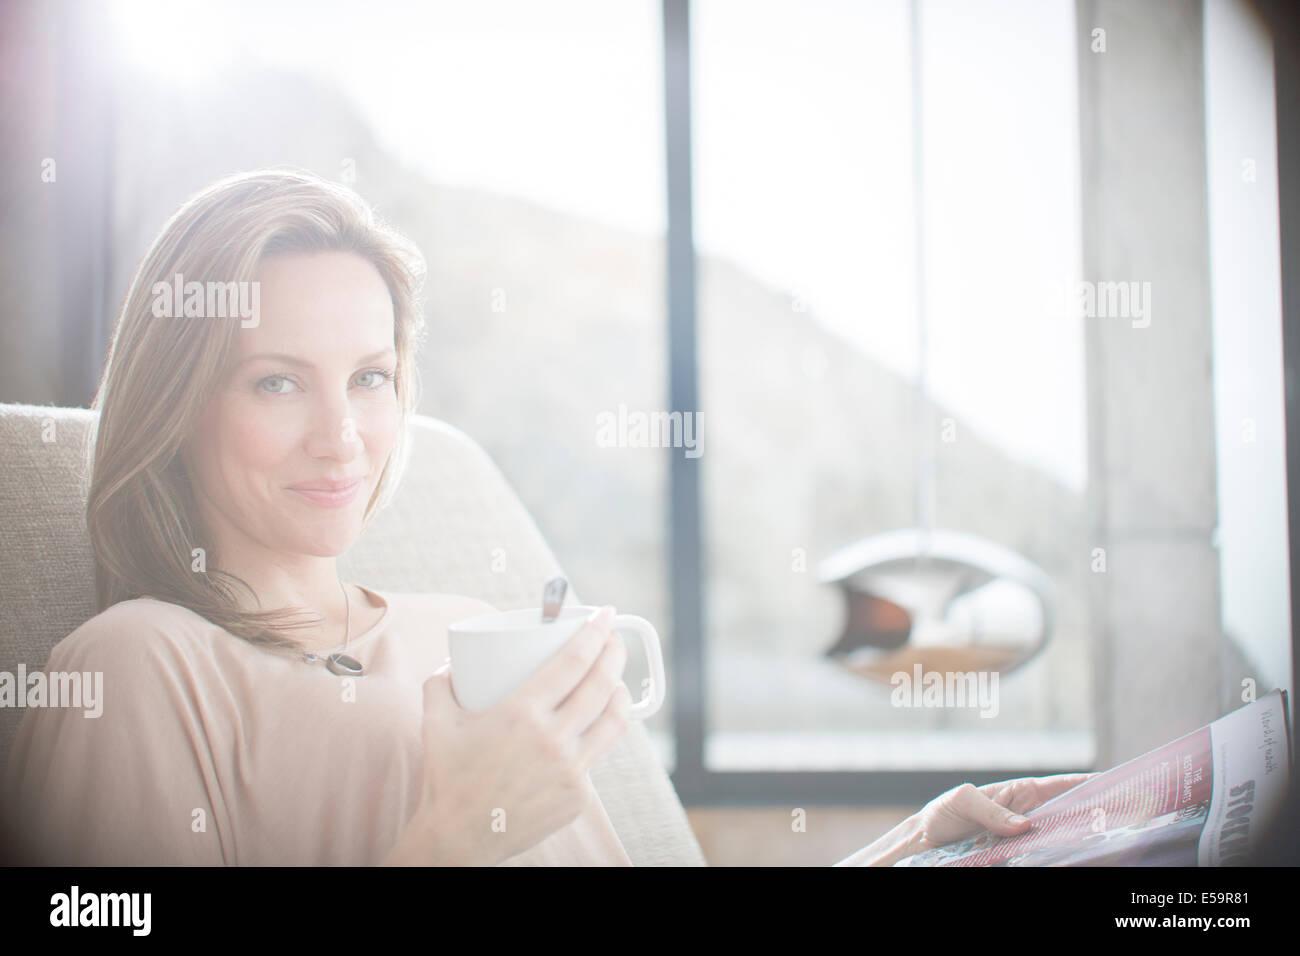 Frau, die Tasse Kaffee auf sofa Stockbild